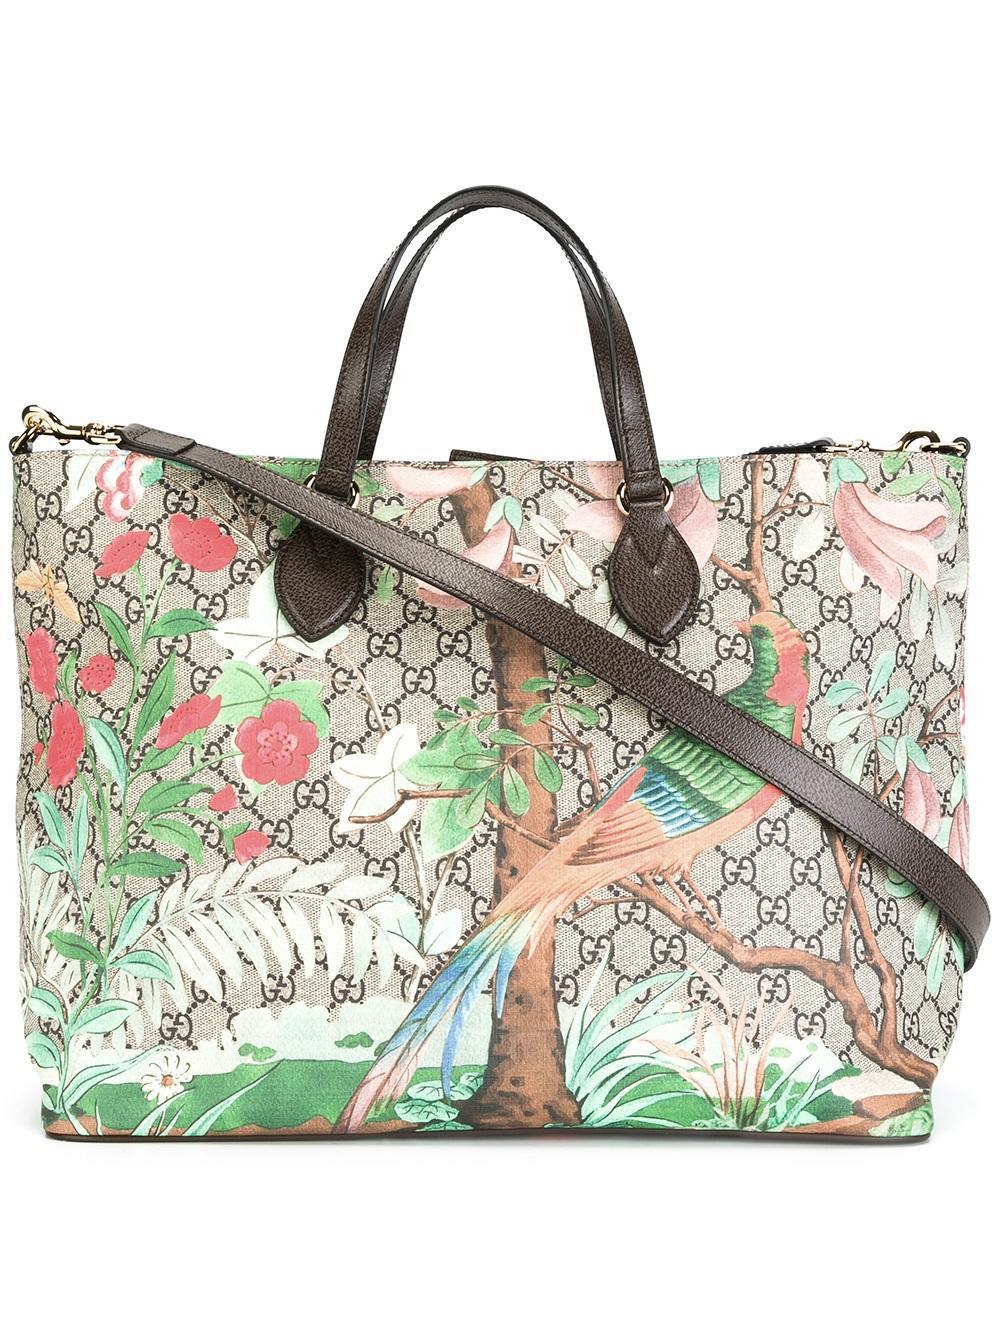 36dc0d74b Gucci Tian Gg Supreme Tote Bag in Brown - Lyst